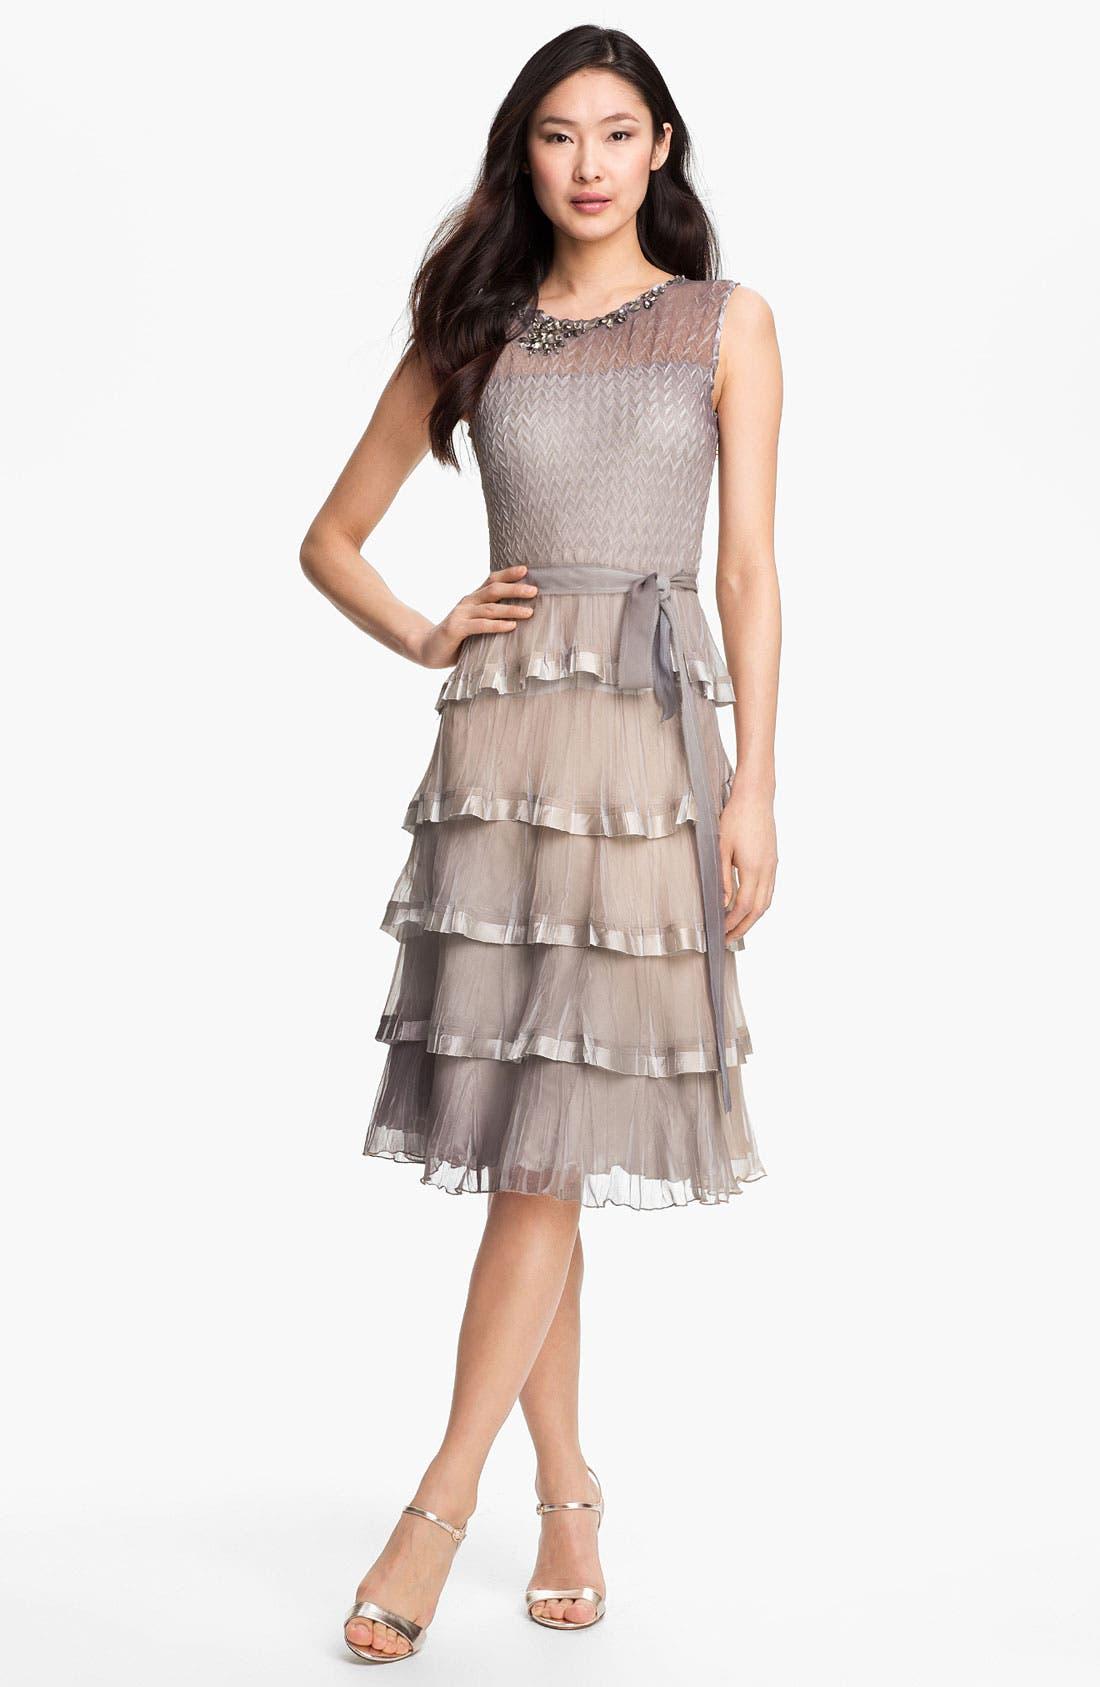 Alternate Image 1 Selected - Black by Komarov Embellished Tiered Ombré Chiffon Dress